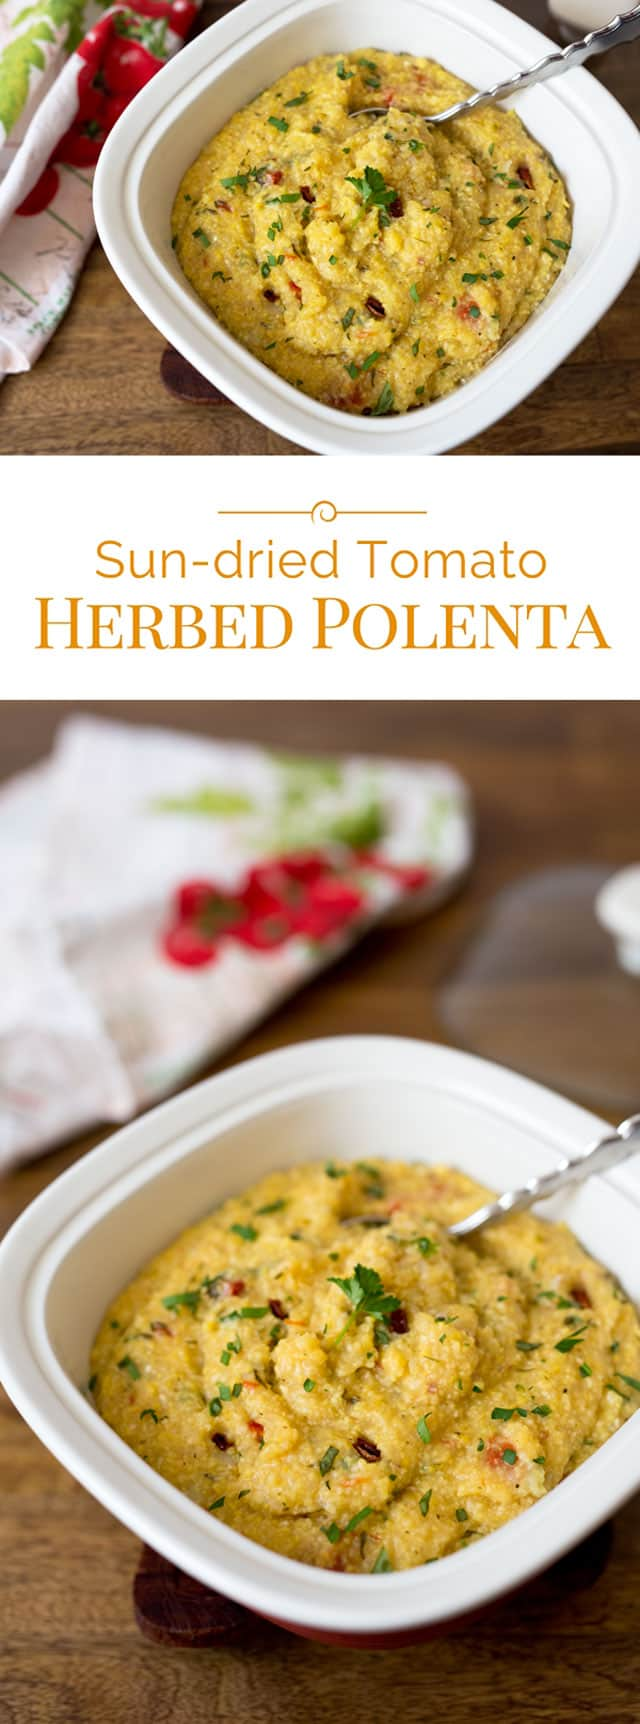 Sun-Dried-Tomato-Herbed-Polenta-Collage